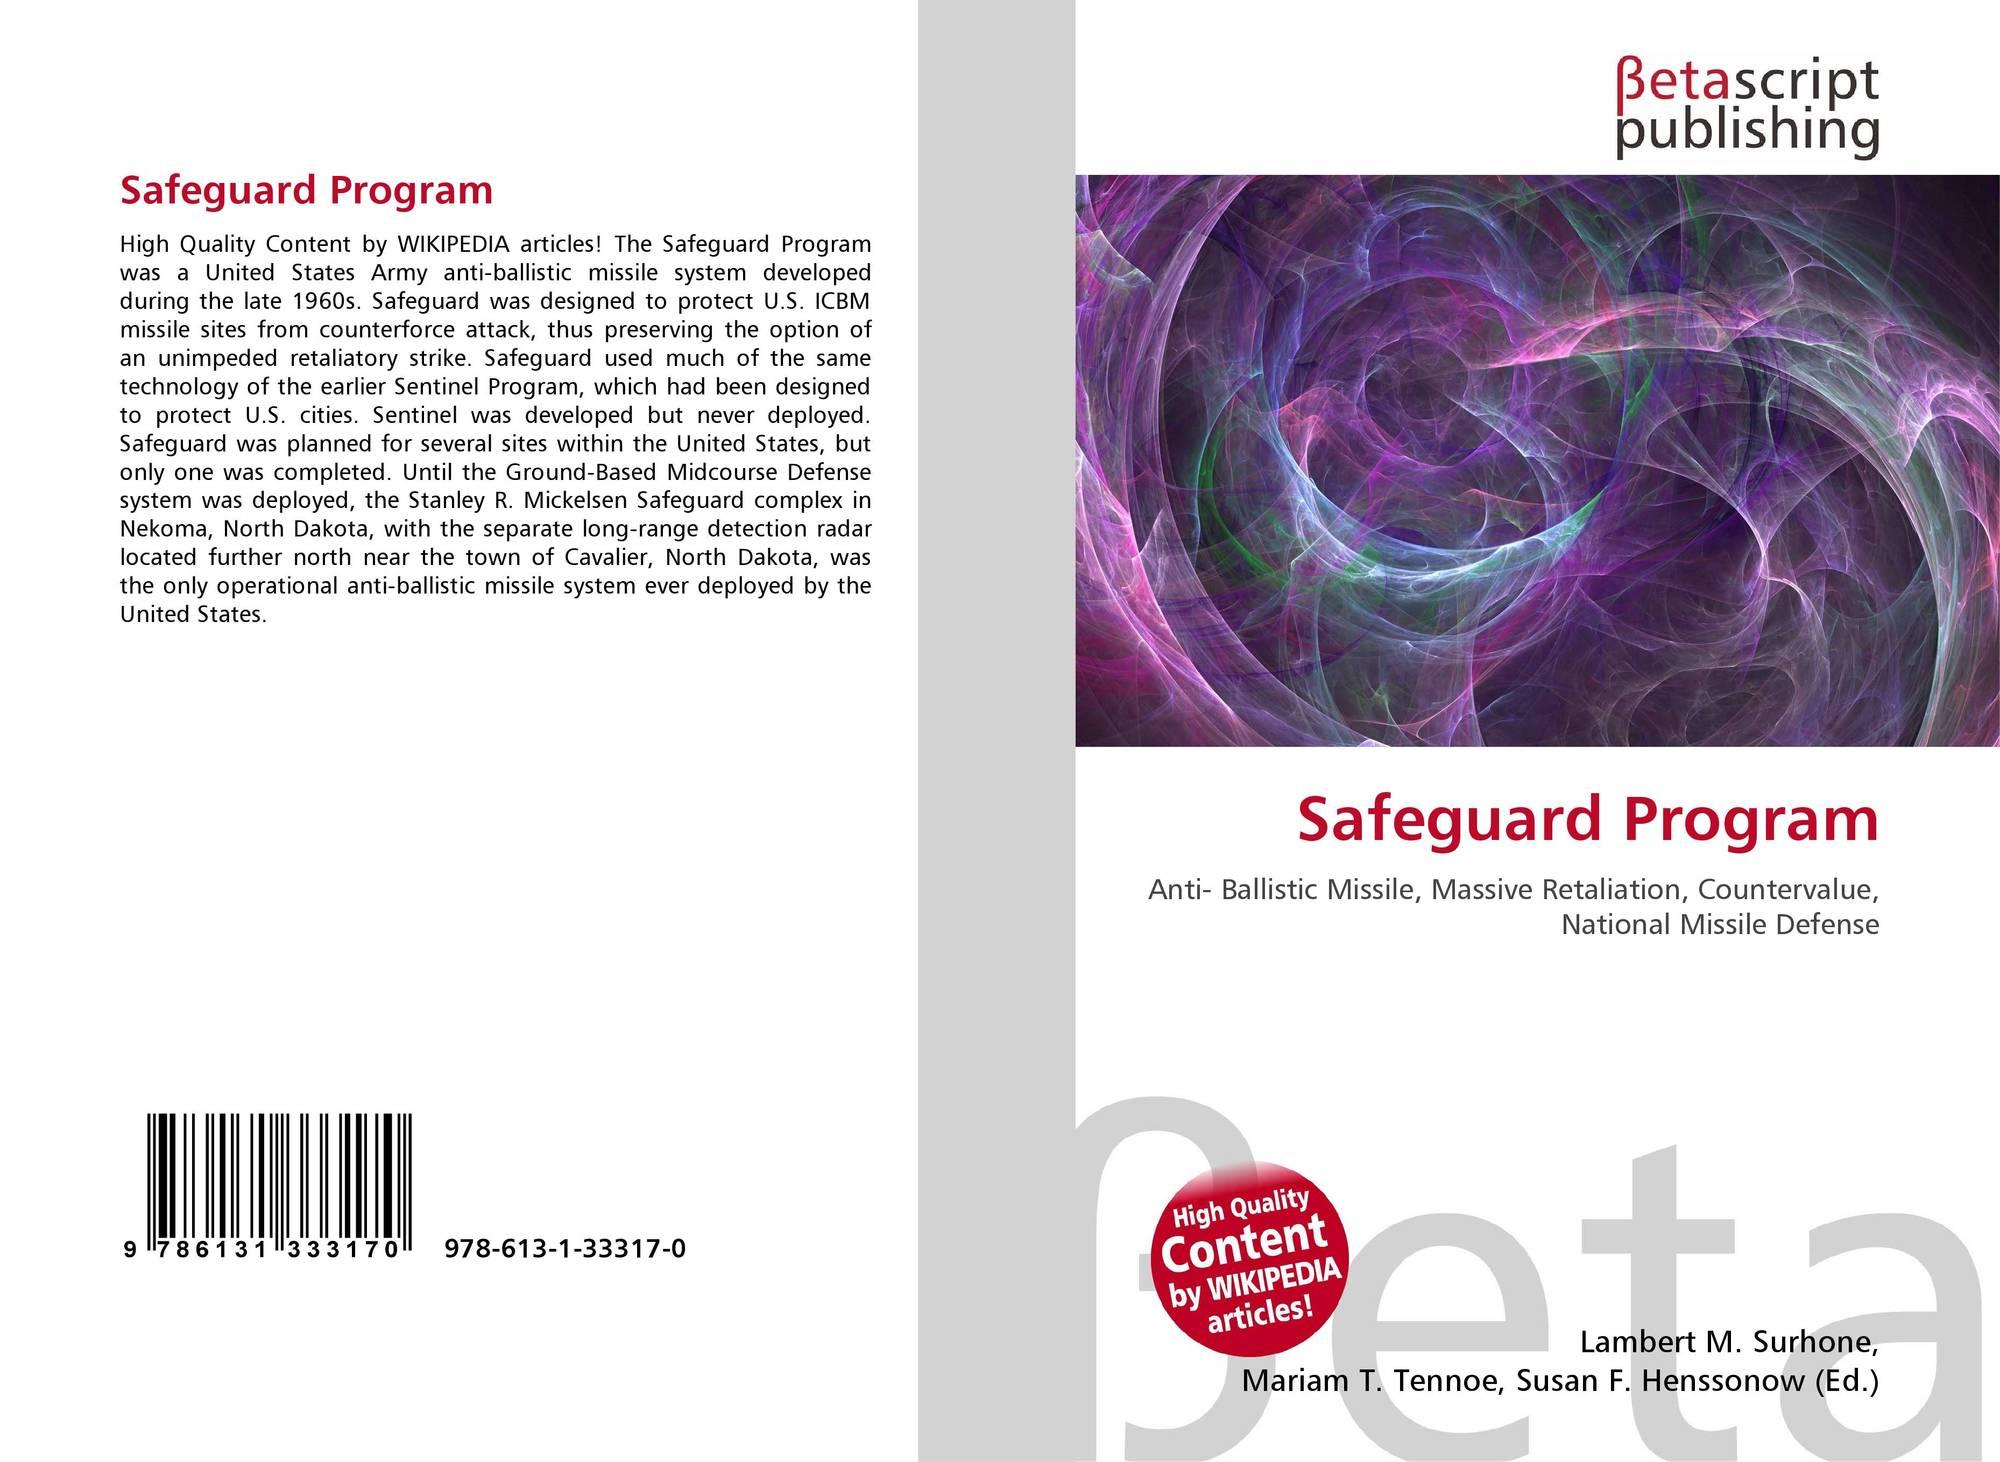 Safeguard Program, 978-613-1-33317-0, 6131333173 ,9786131333170